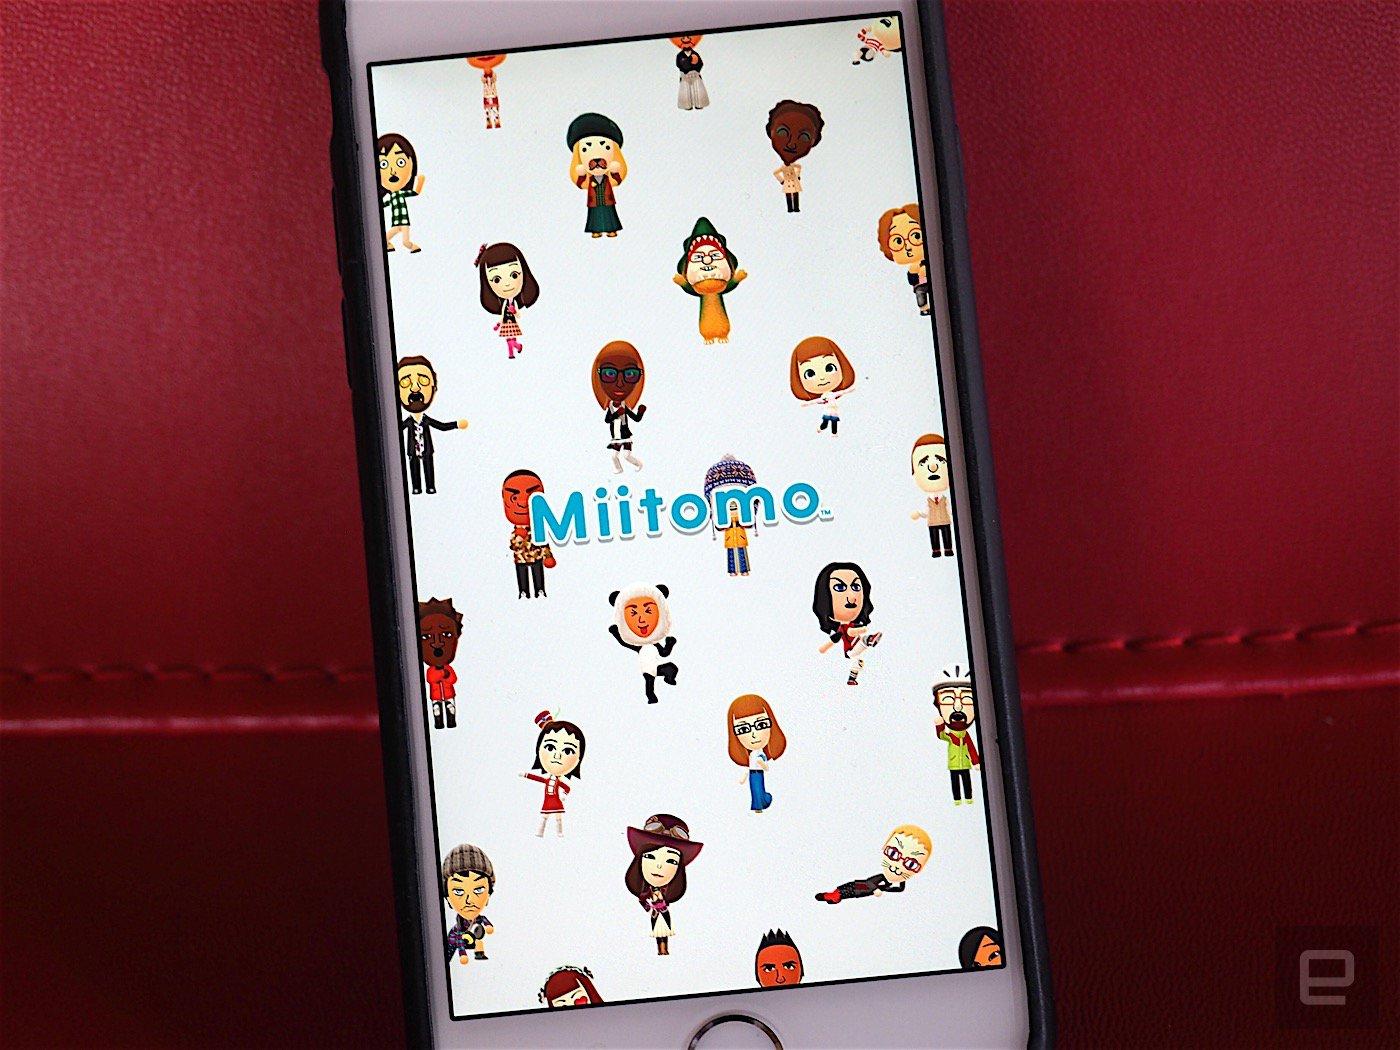 'Miitomo' gamers are apparently leaving behind Nintendo's app